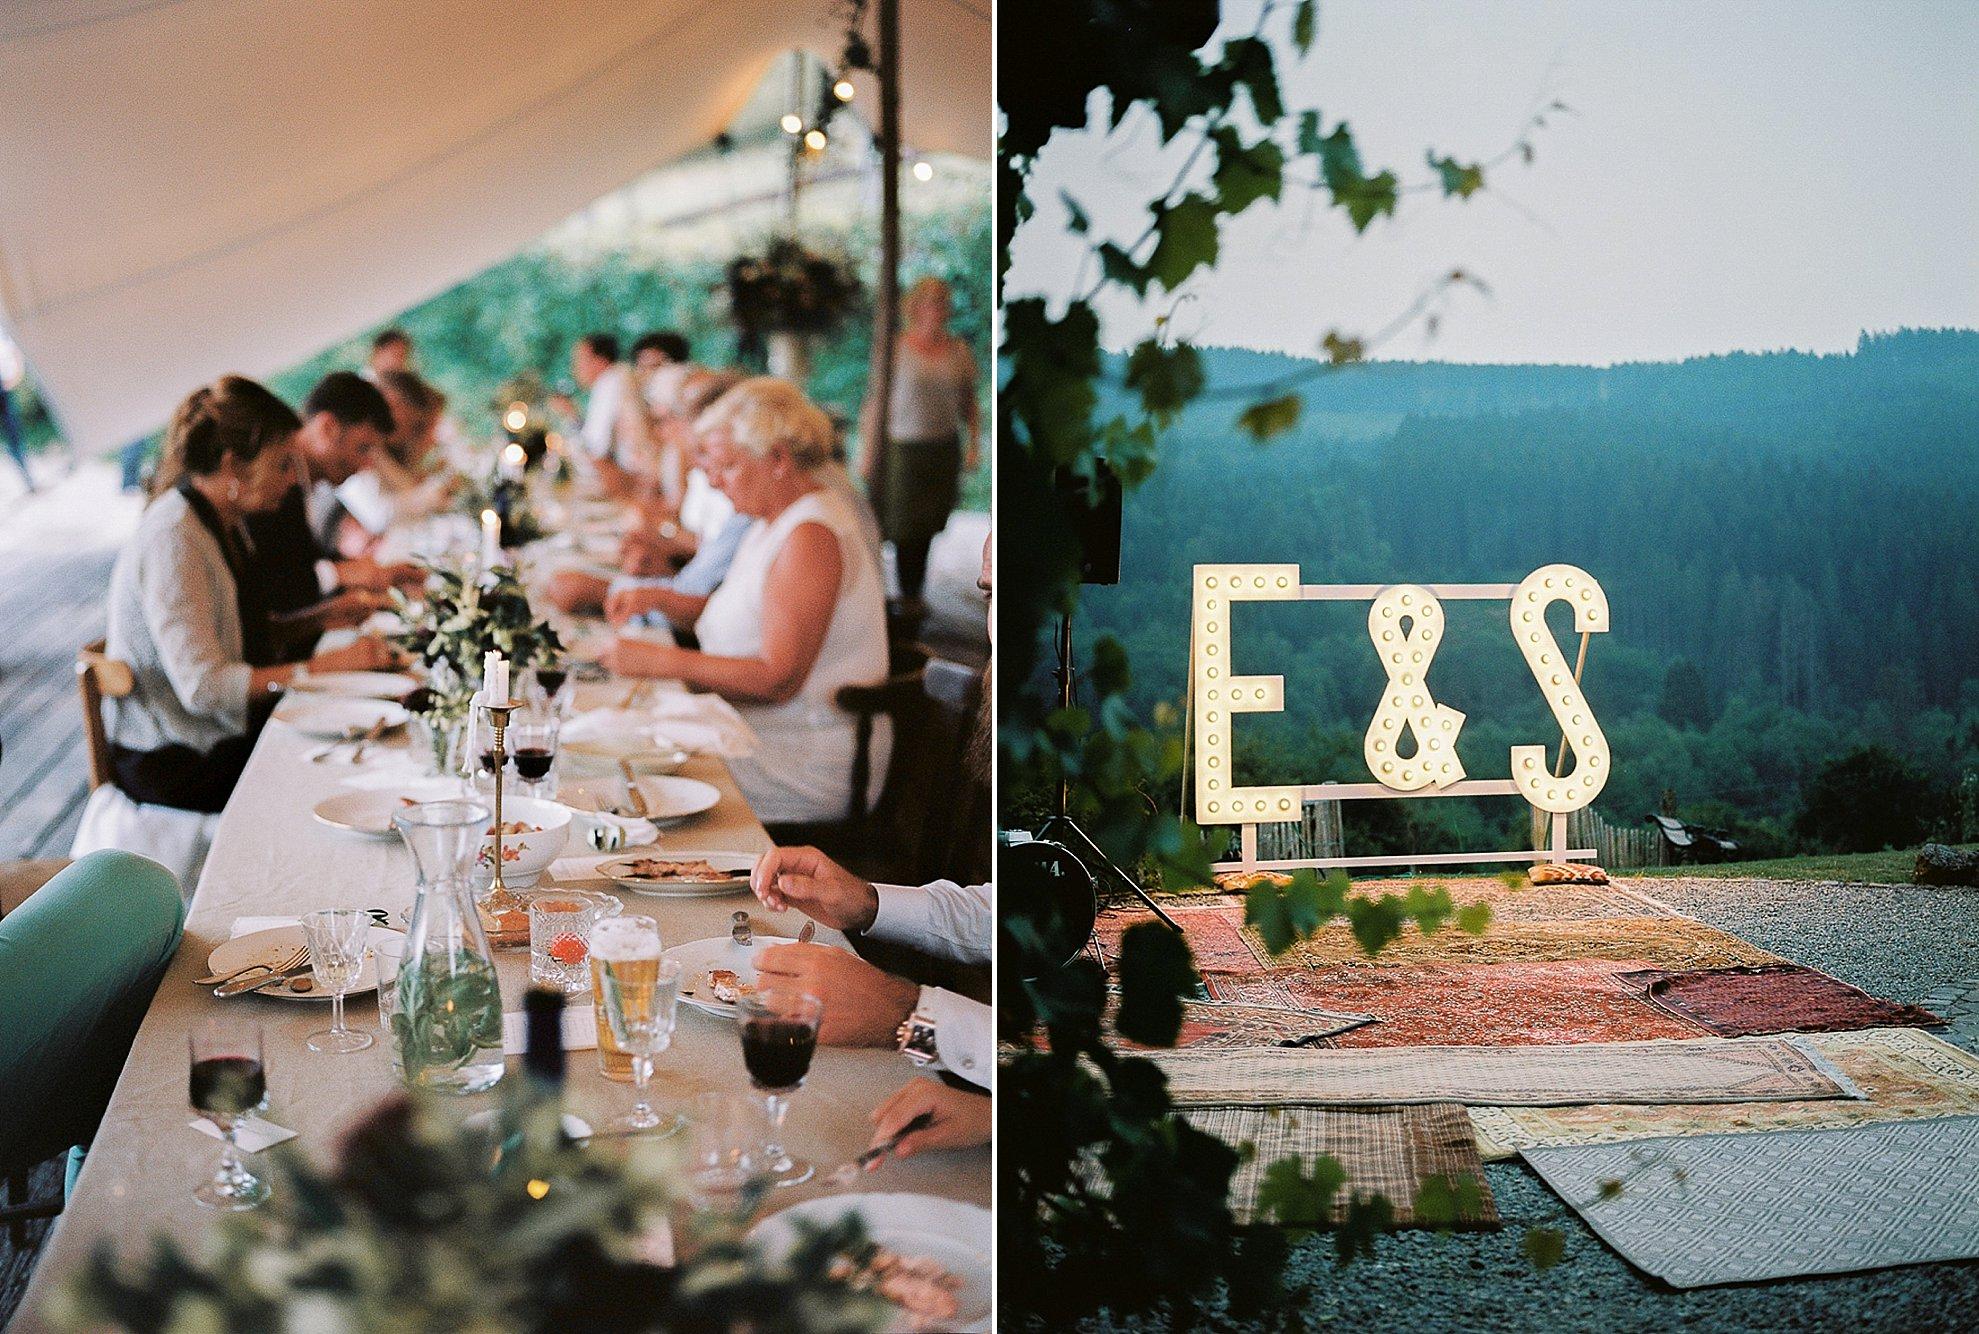 Amanda-Drost-Fotografie-Belgie-Photography-Wedding_0041.jpg